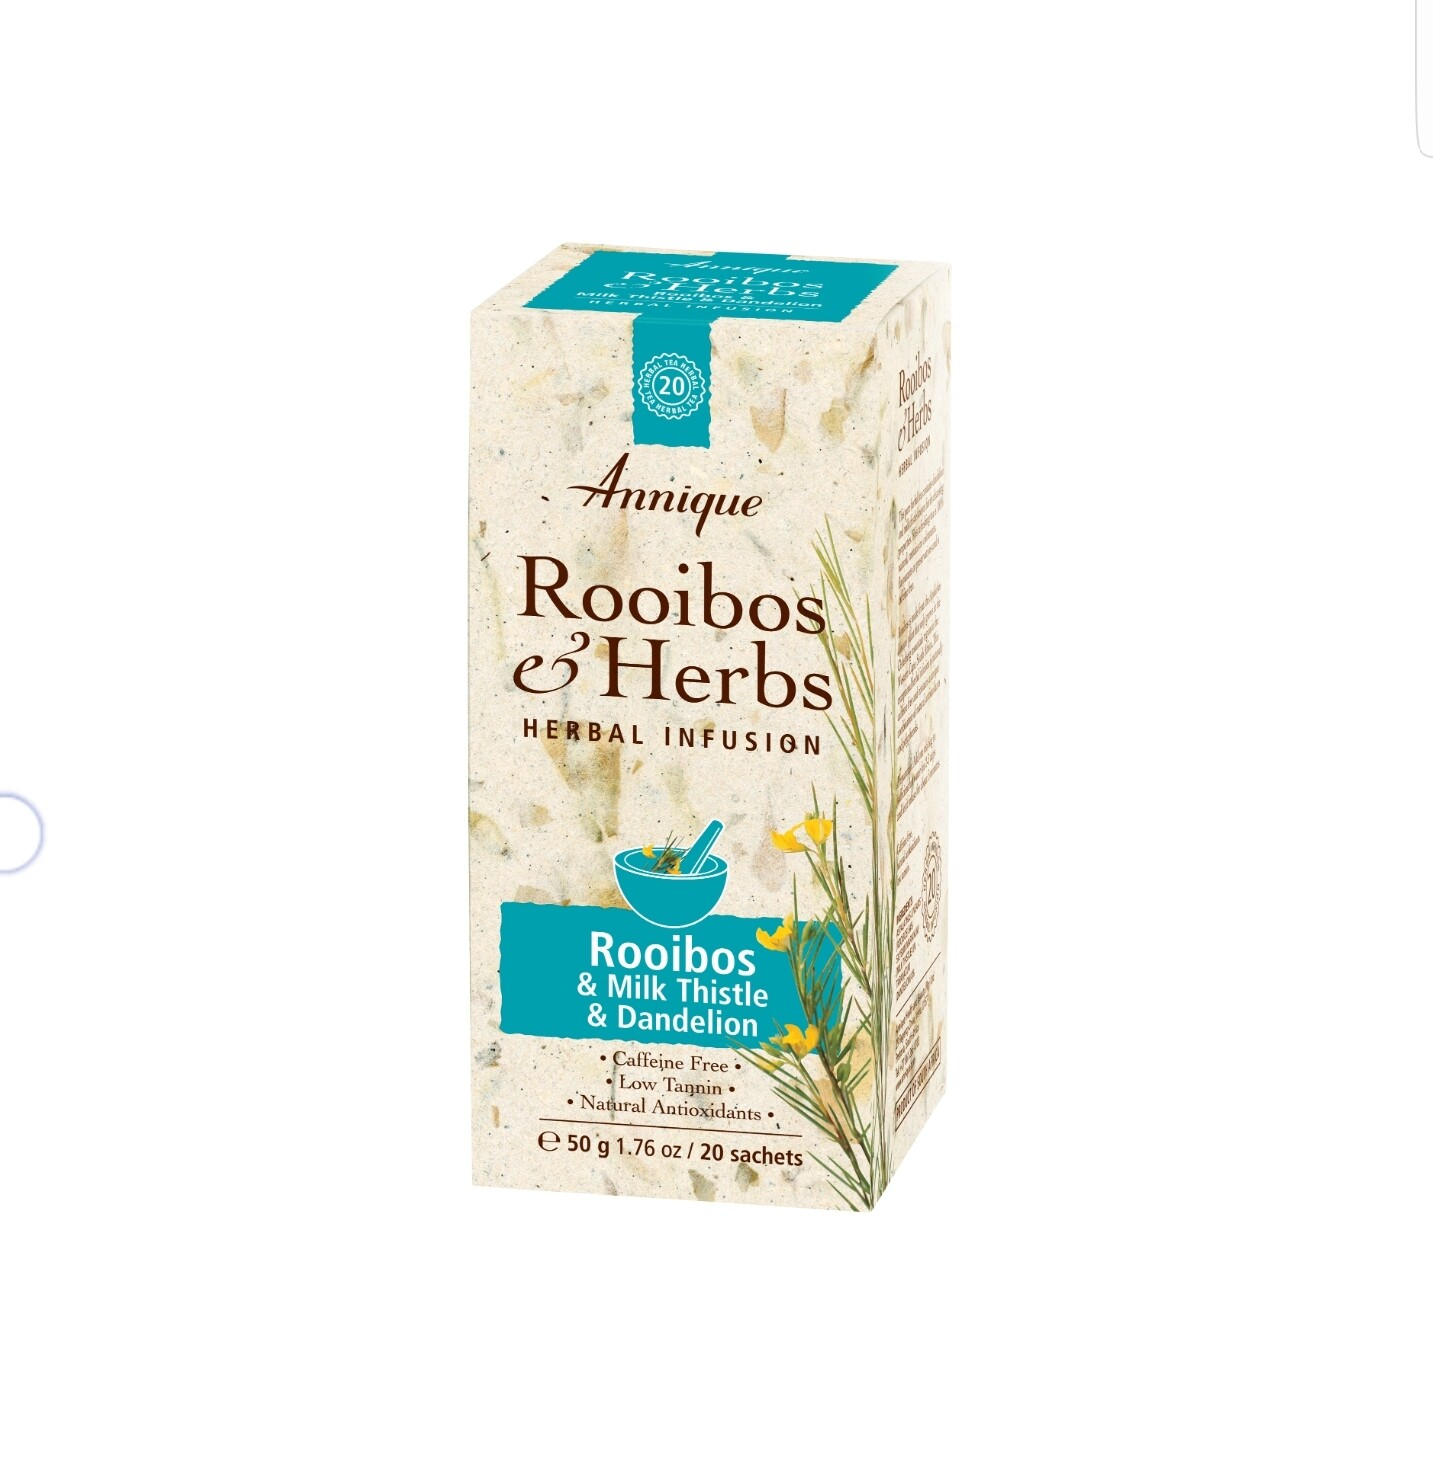 Annique Rooibos & Milk Thistle & Dandelion Tea (Previous Liver Cleanse Rooibos Tea) 50g | 20 bags